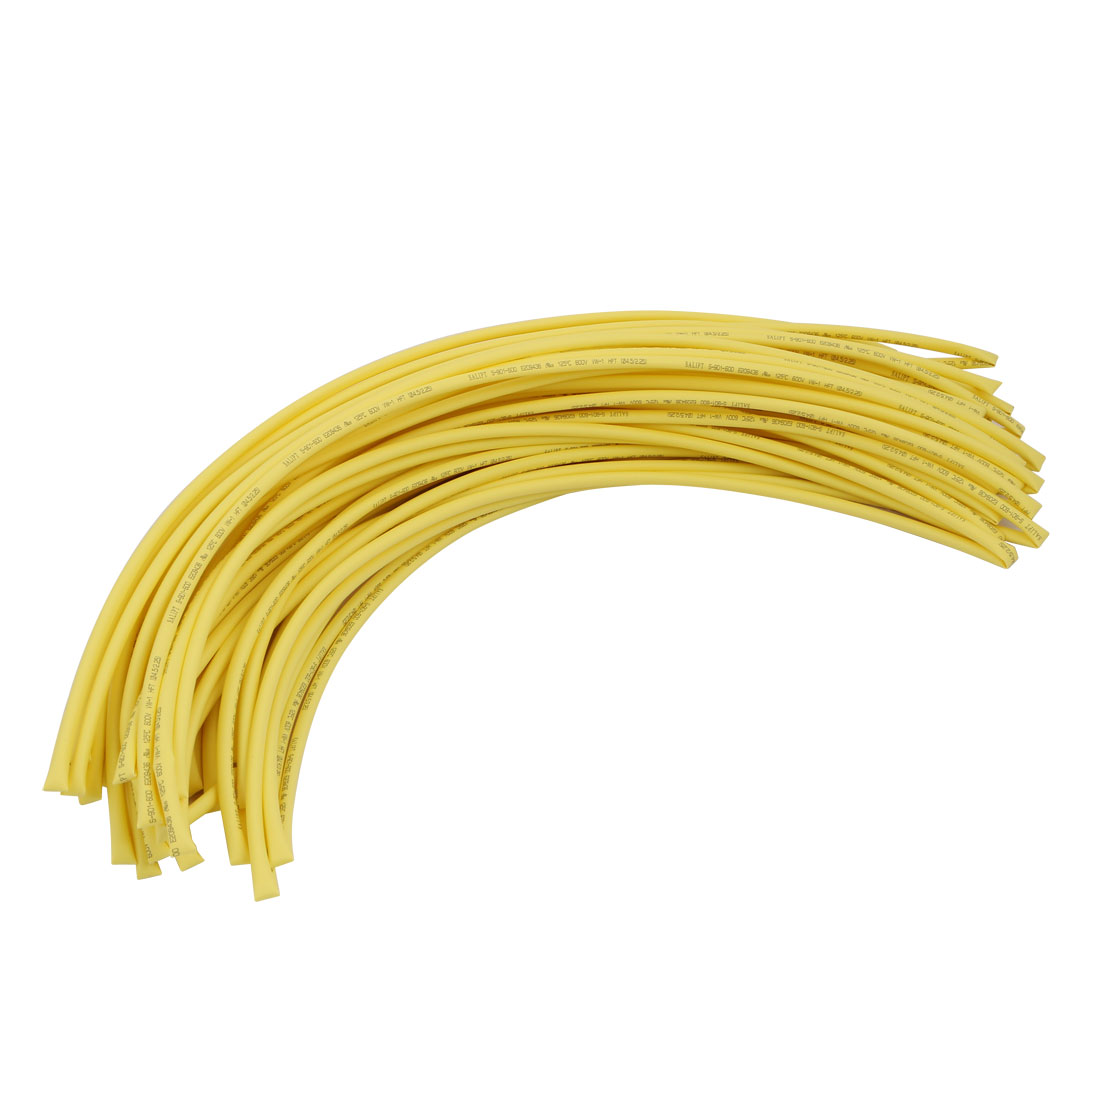 25M 0.18in Inner Dia Polyolefin Flame Retardant Tube Yellow for Wire Repairing